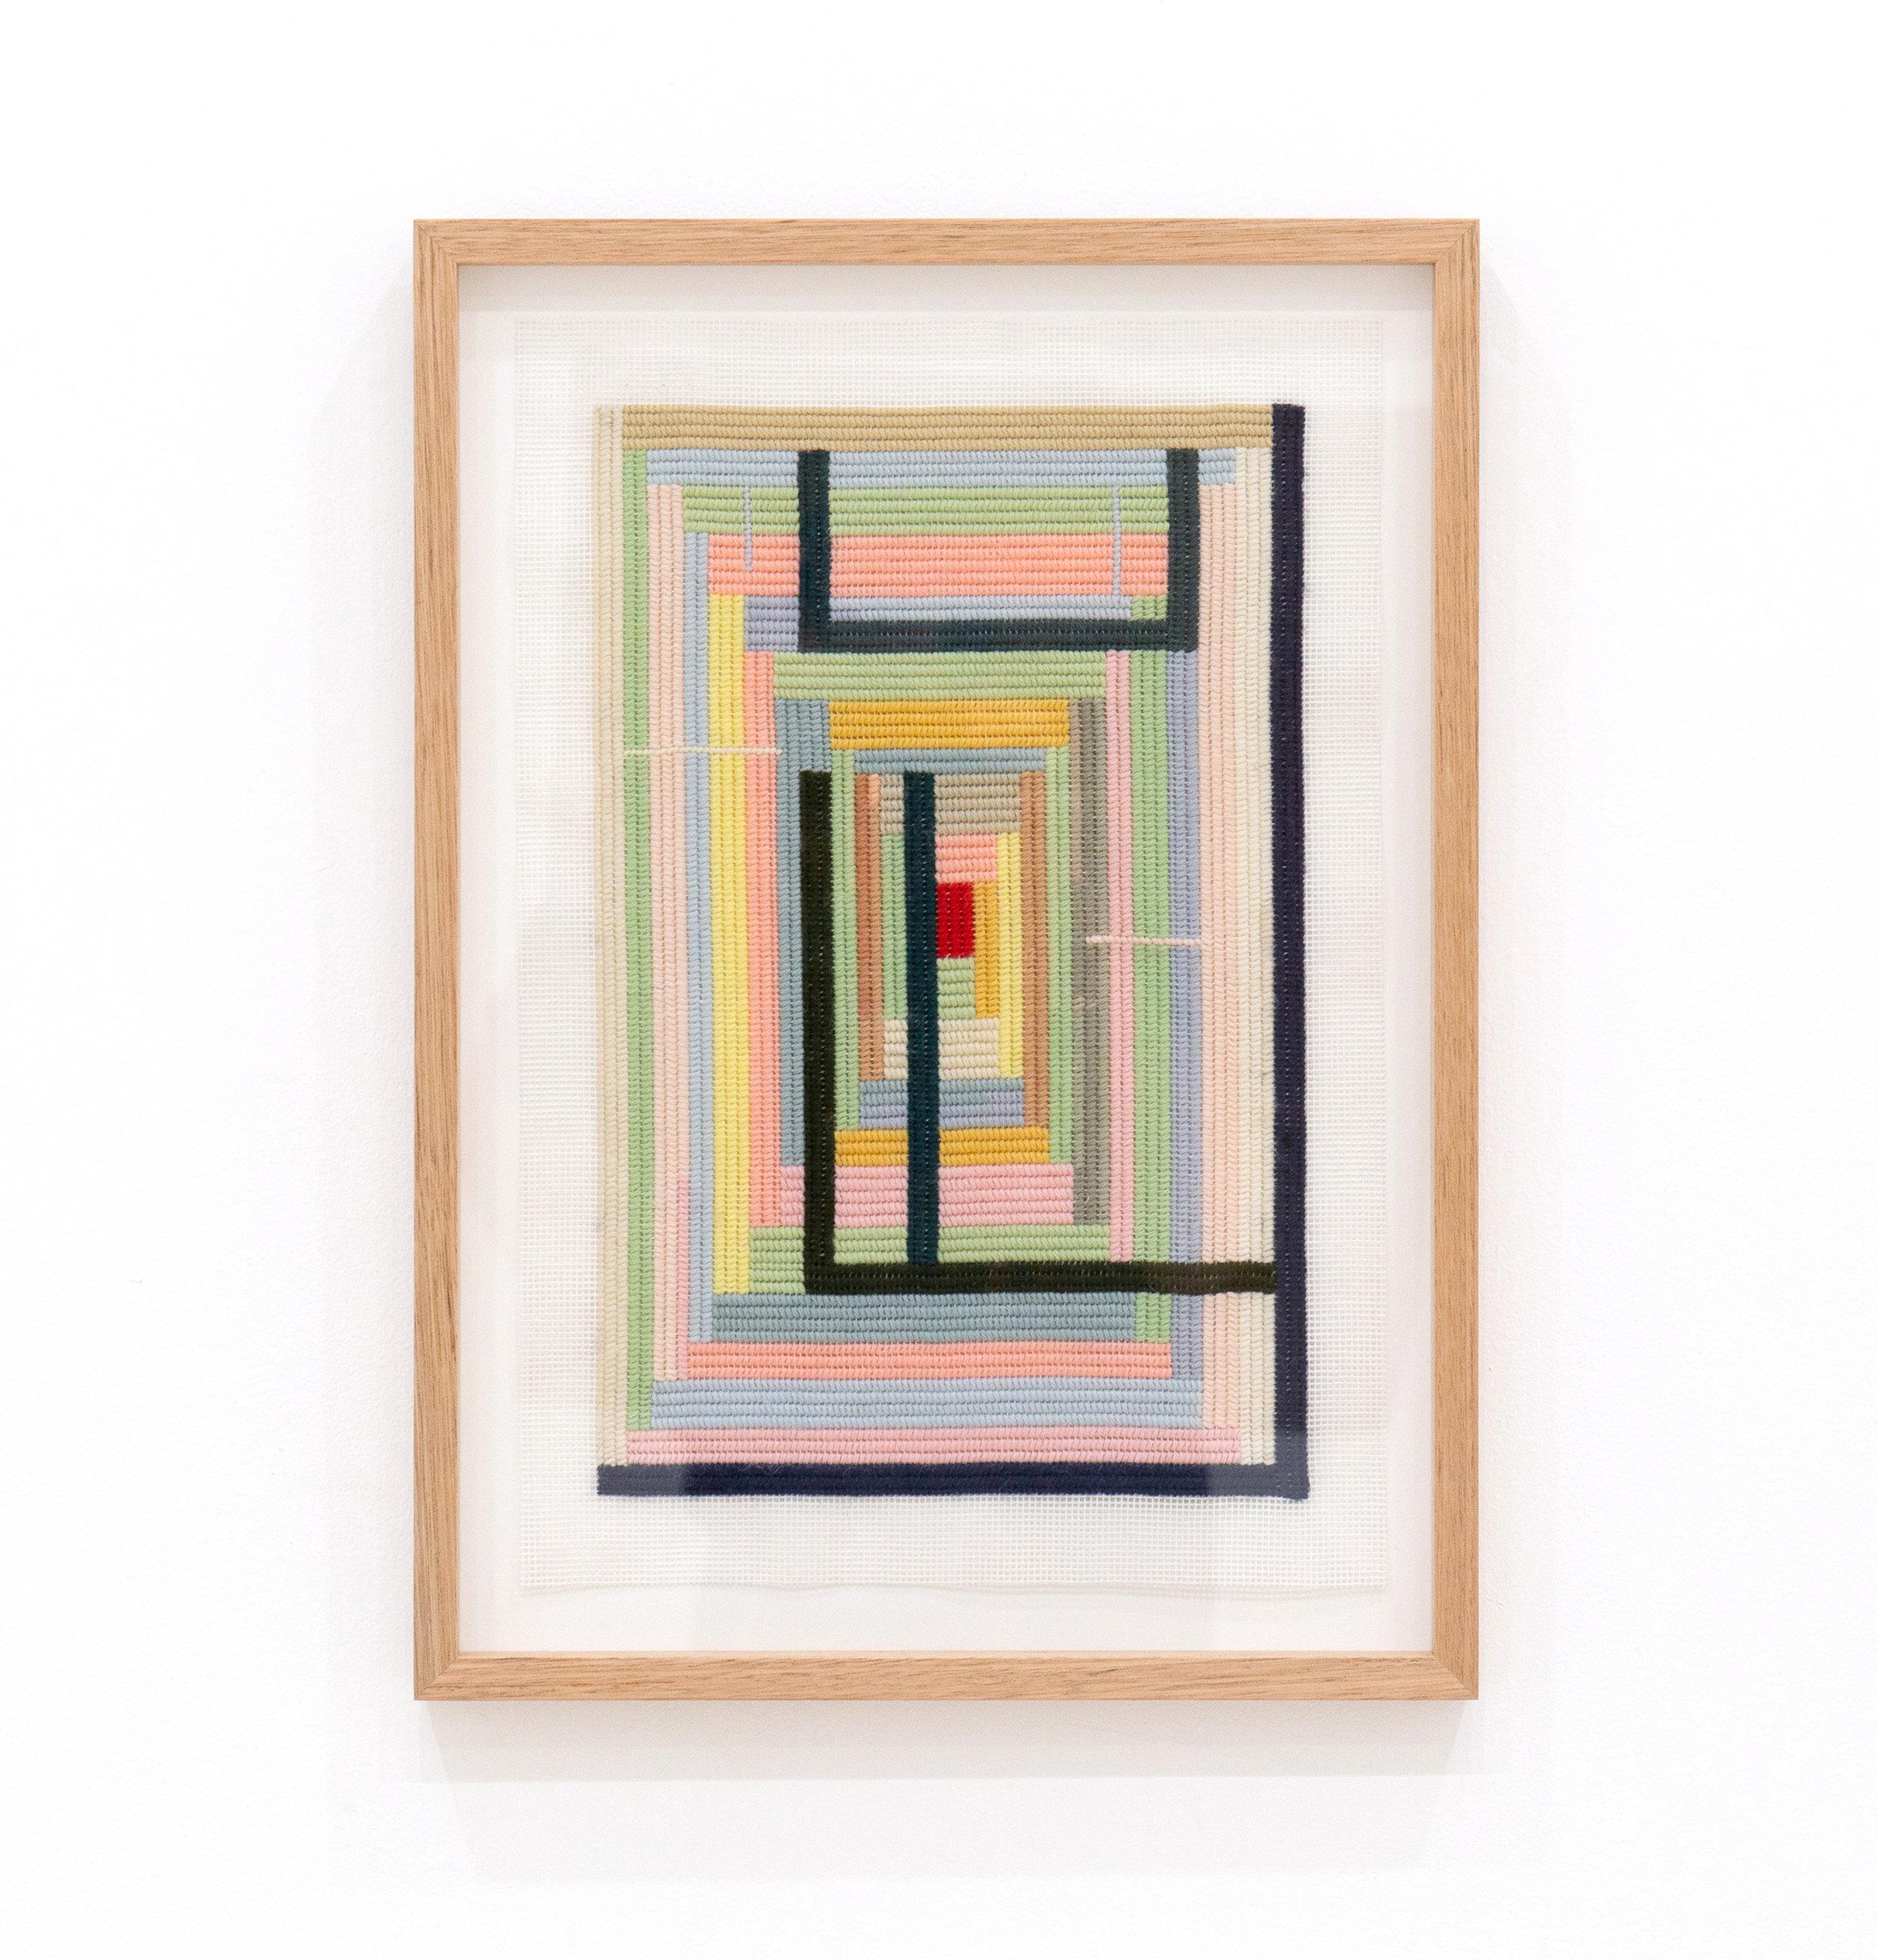 SARAH crowEST  Big Bout Ya  2019 wool on needlepoint canvas 37 × 24 cm Framed 50 × 36 cm